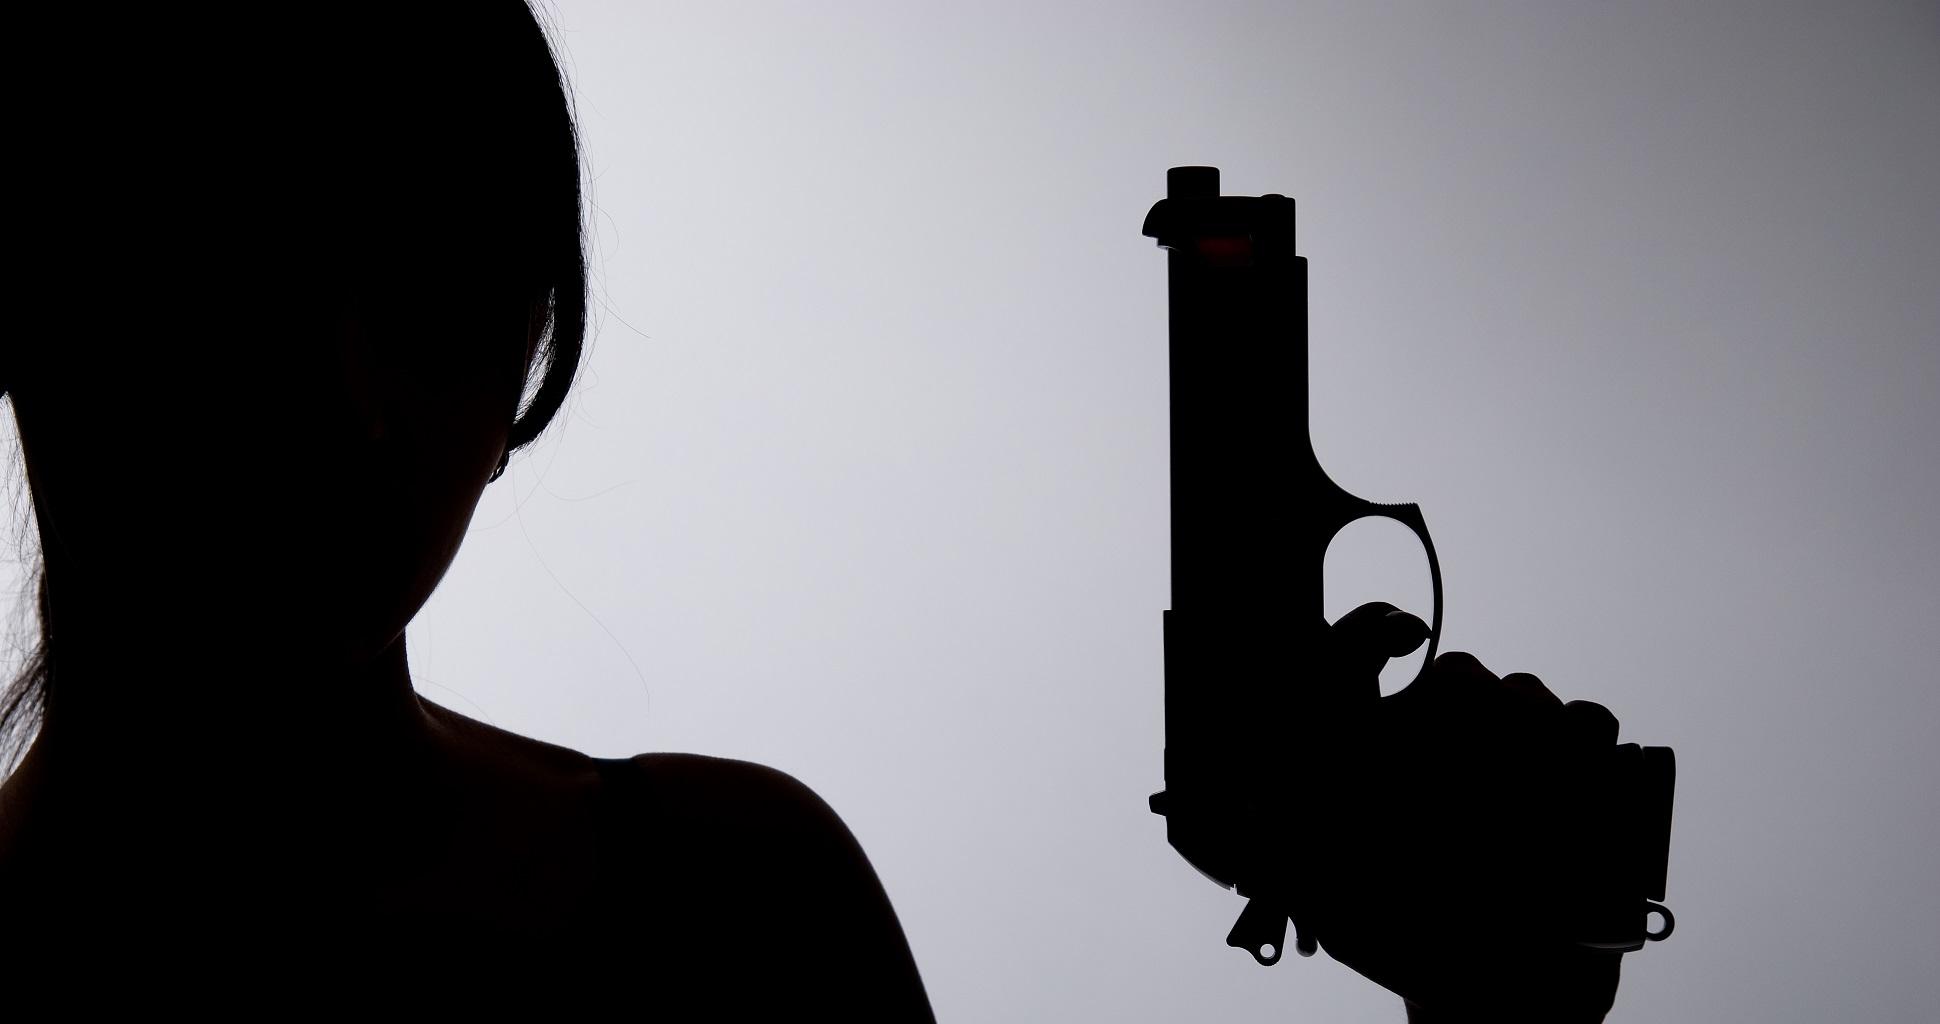 The Best Handgun For Women